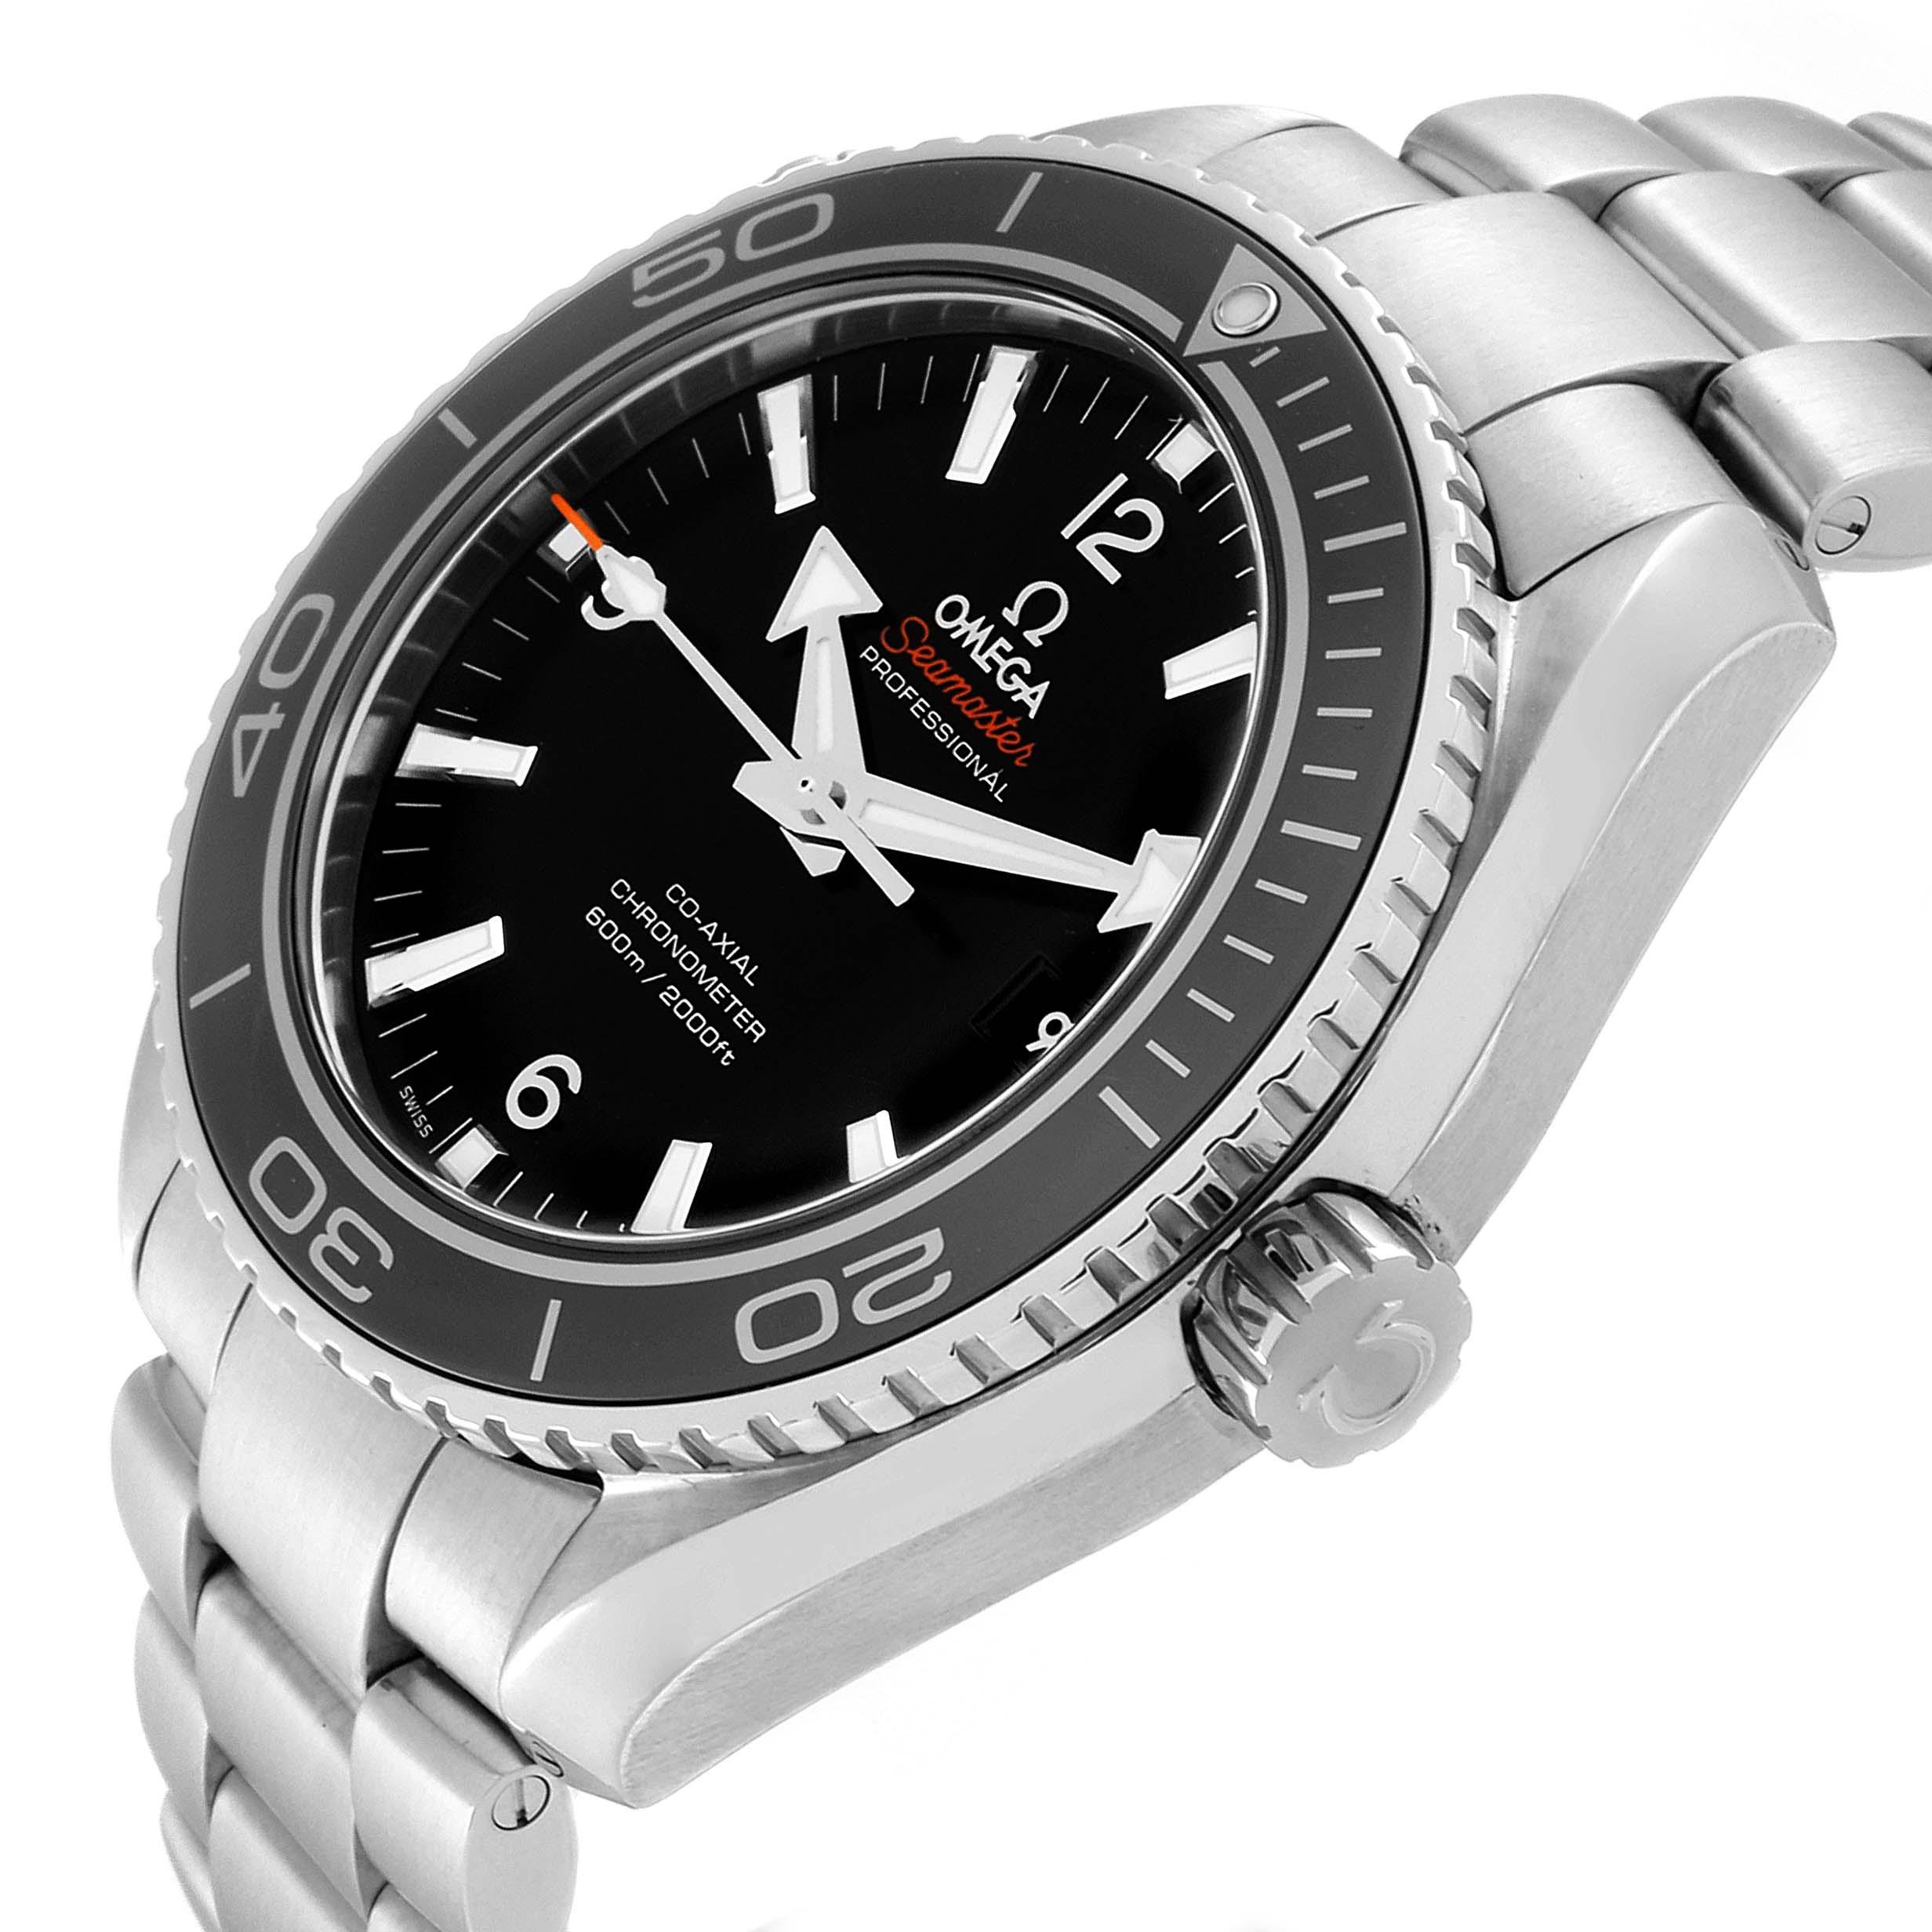 Omega Seamaster Planet Ocean 600M Mens Watch 232.30.46.21.01.001 SwissWatchExpo